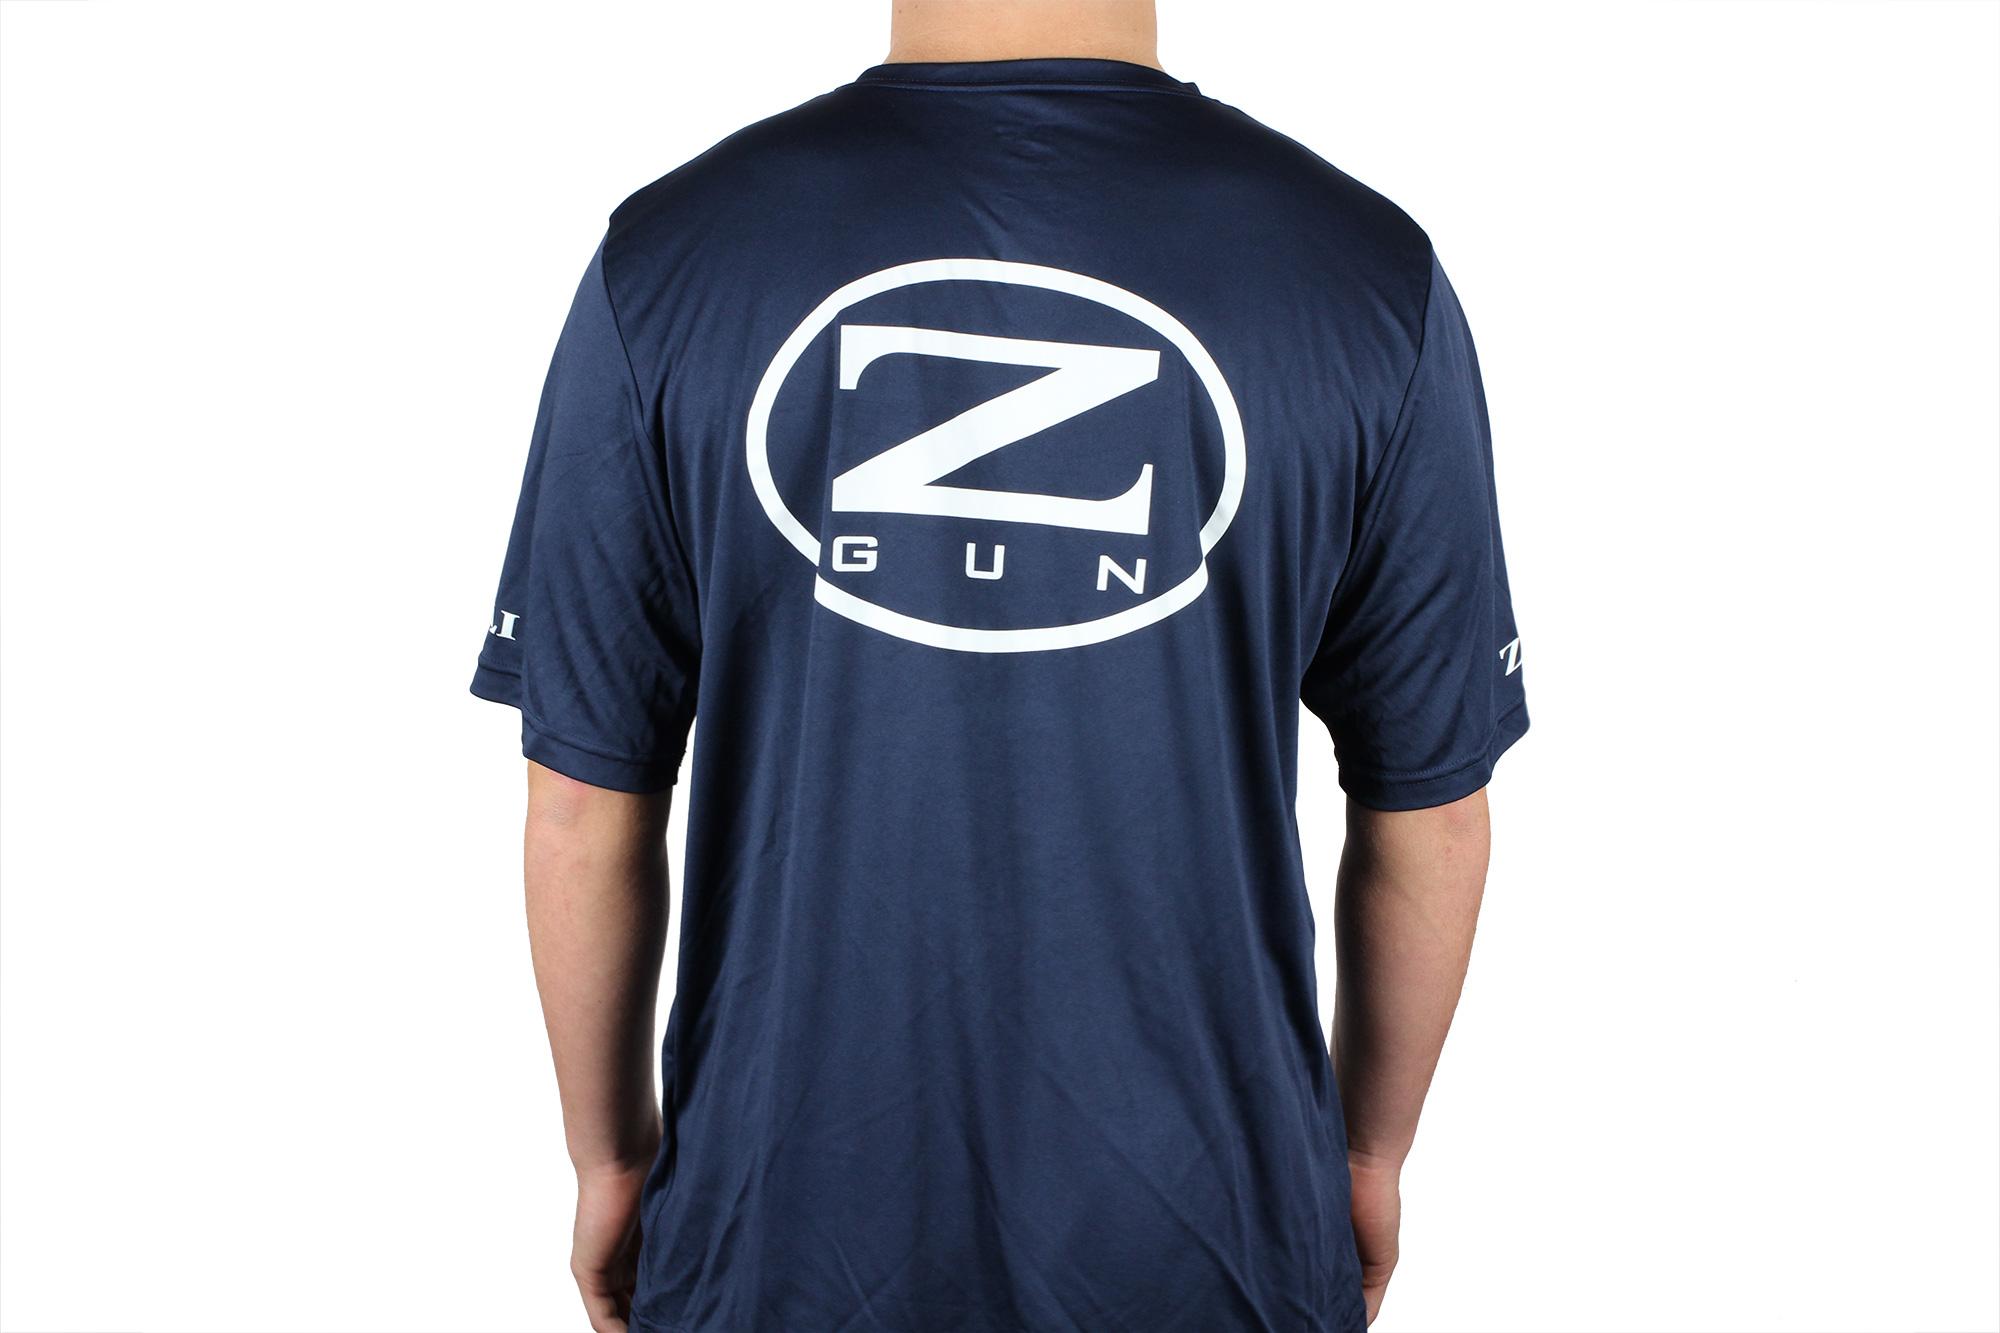 Zoli Z-GUN Navy Sport Shirt back